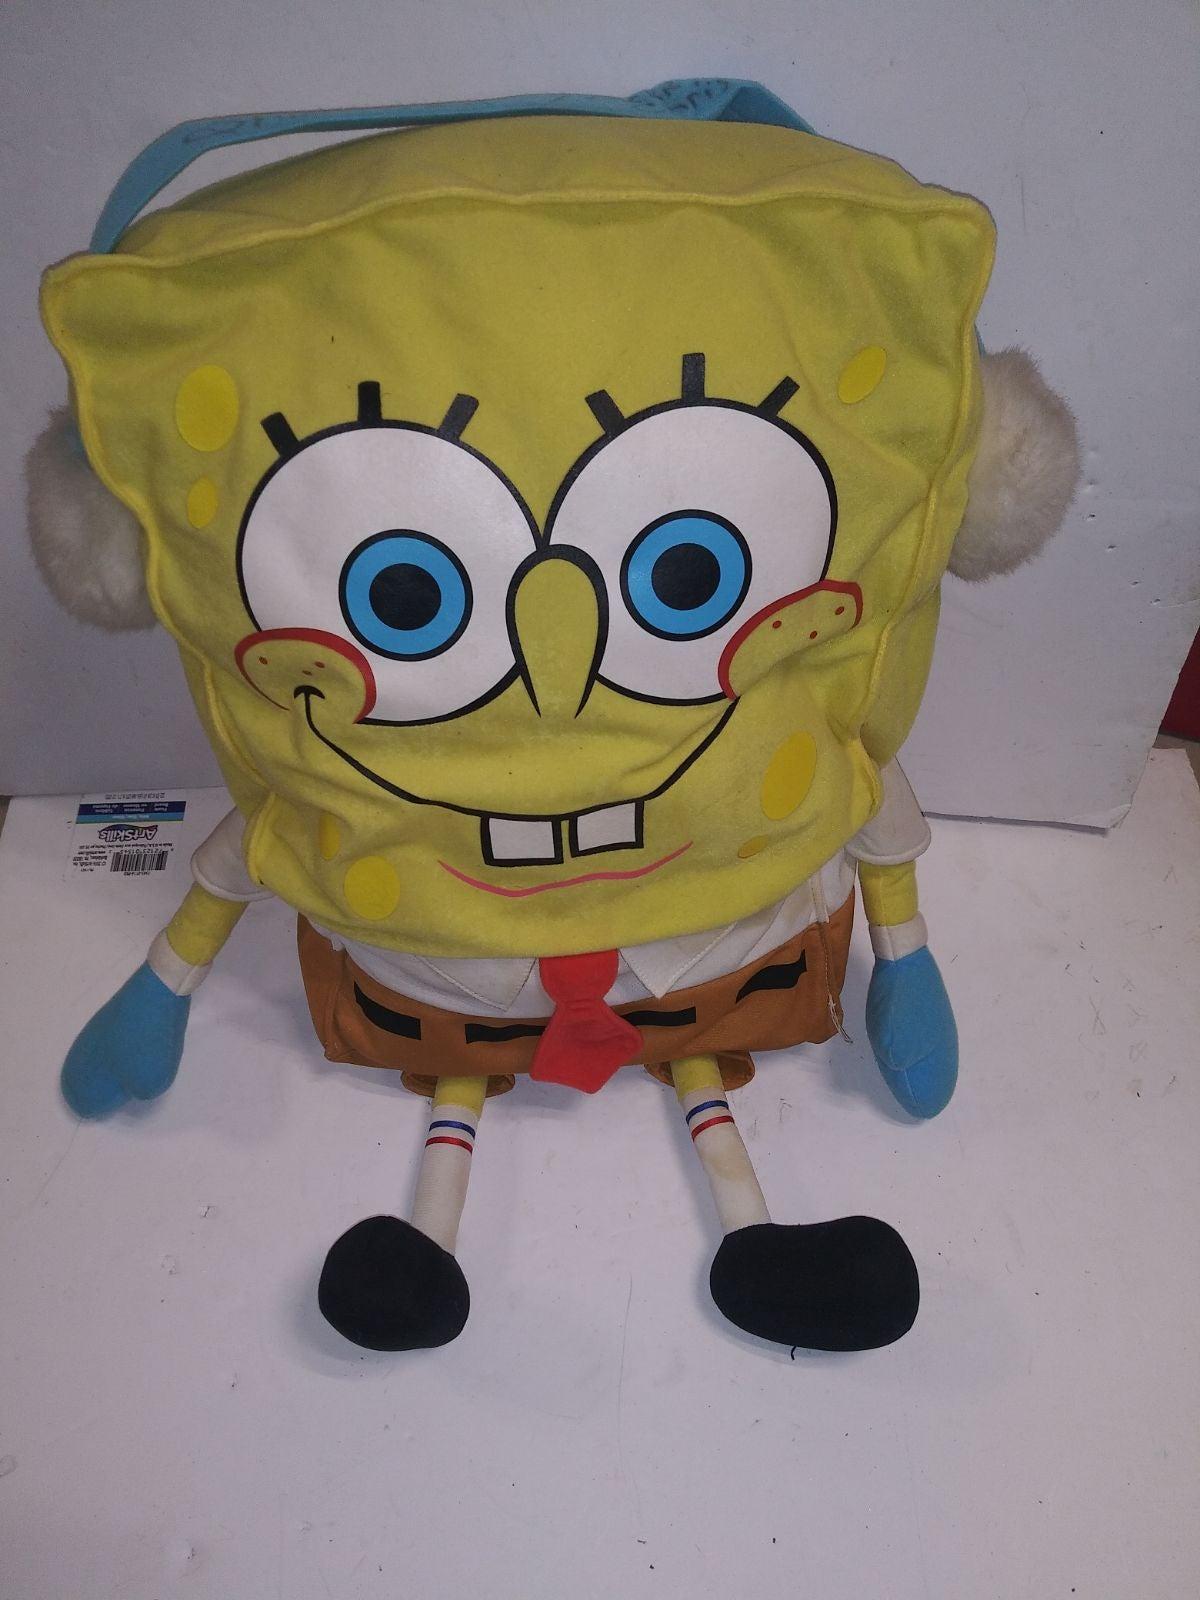 2003 Spongebob SquarePants Earmuffs Larg